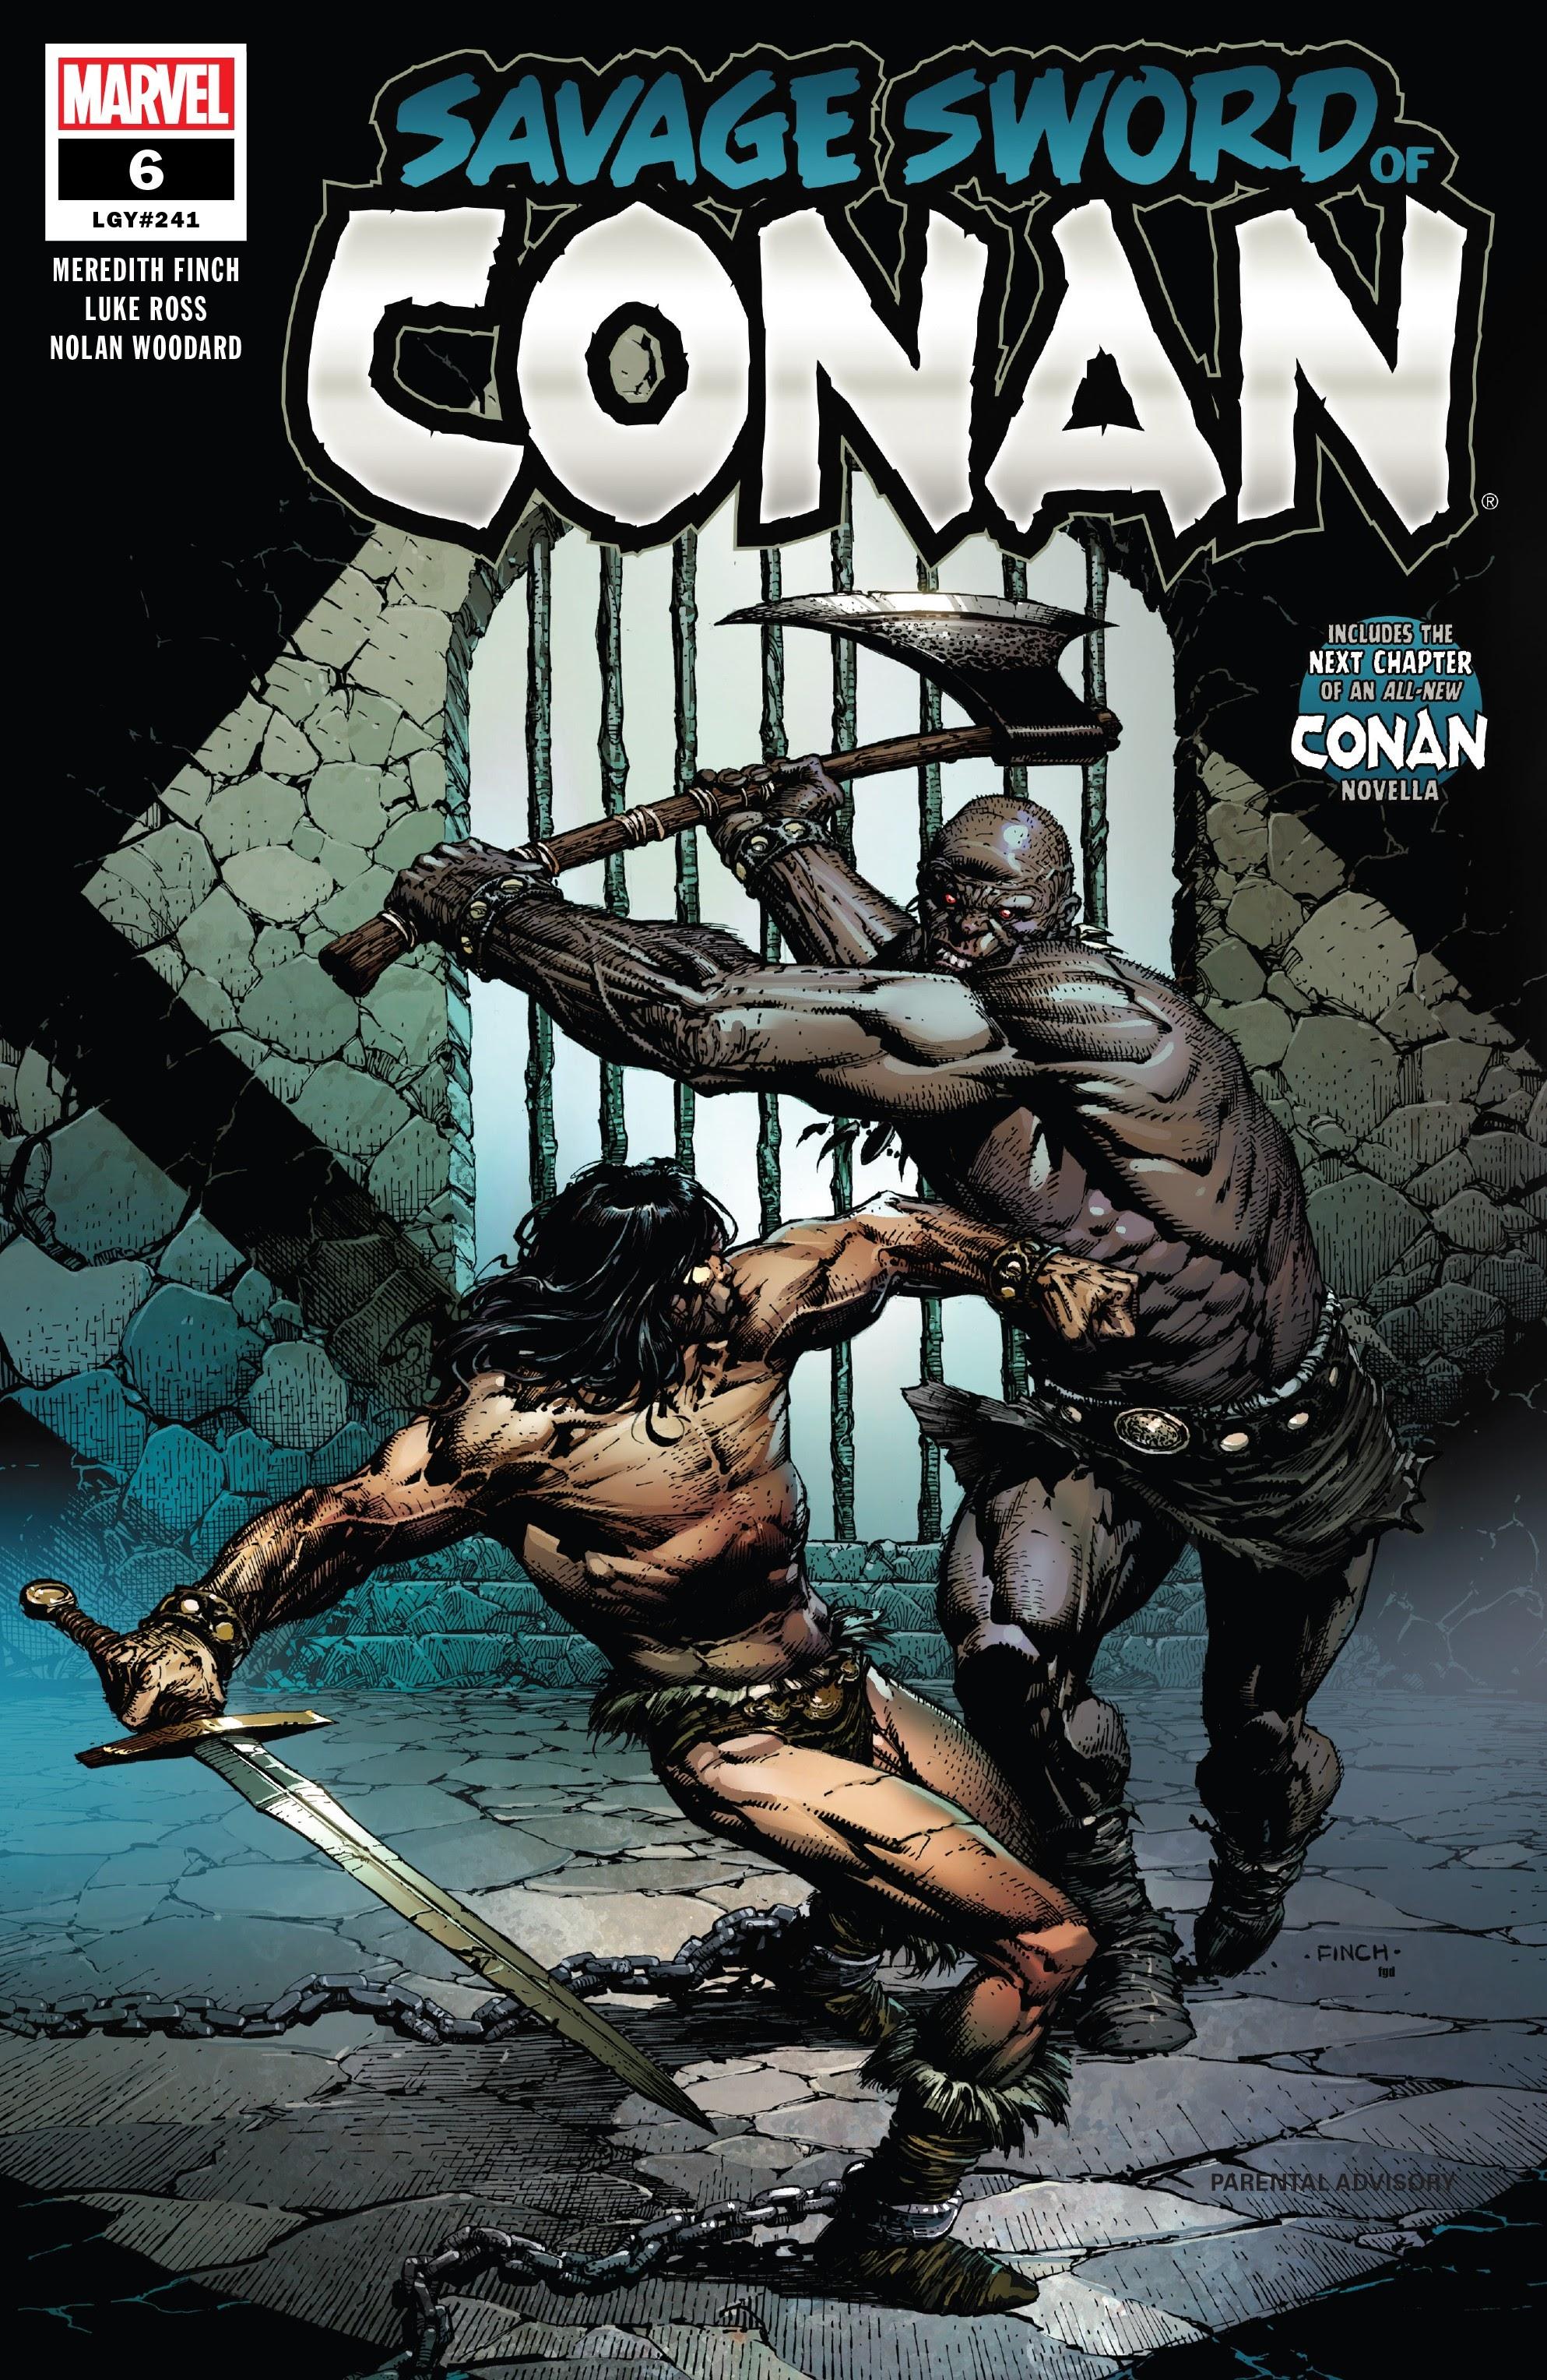 Read online Savage Sword of Conan comic -  Issue #6 - 1